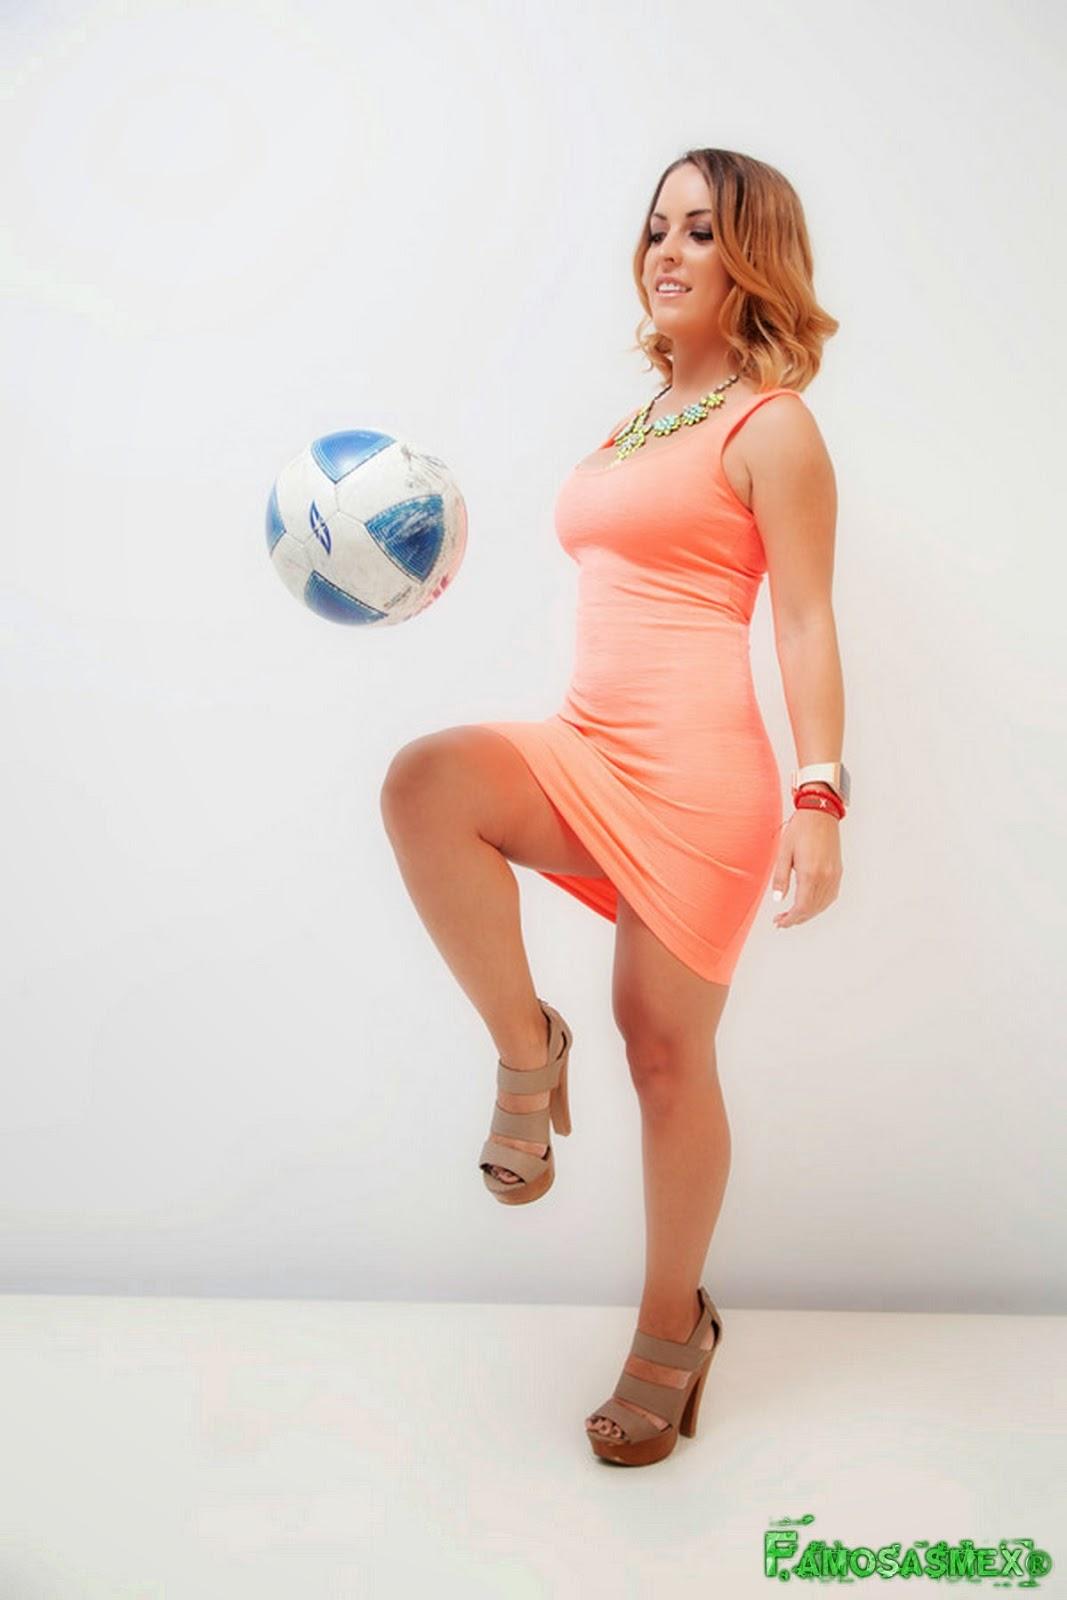 Patty Lopez de la Cerda Photoshoot x10 HQ - Sexy Modelos Famosas